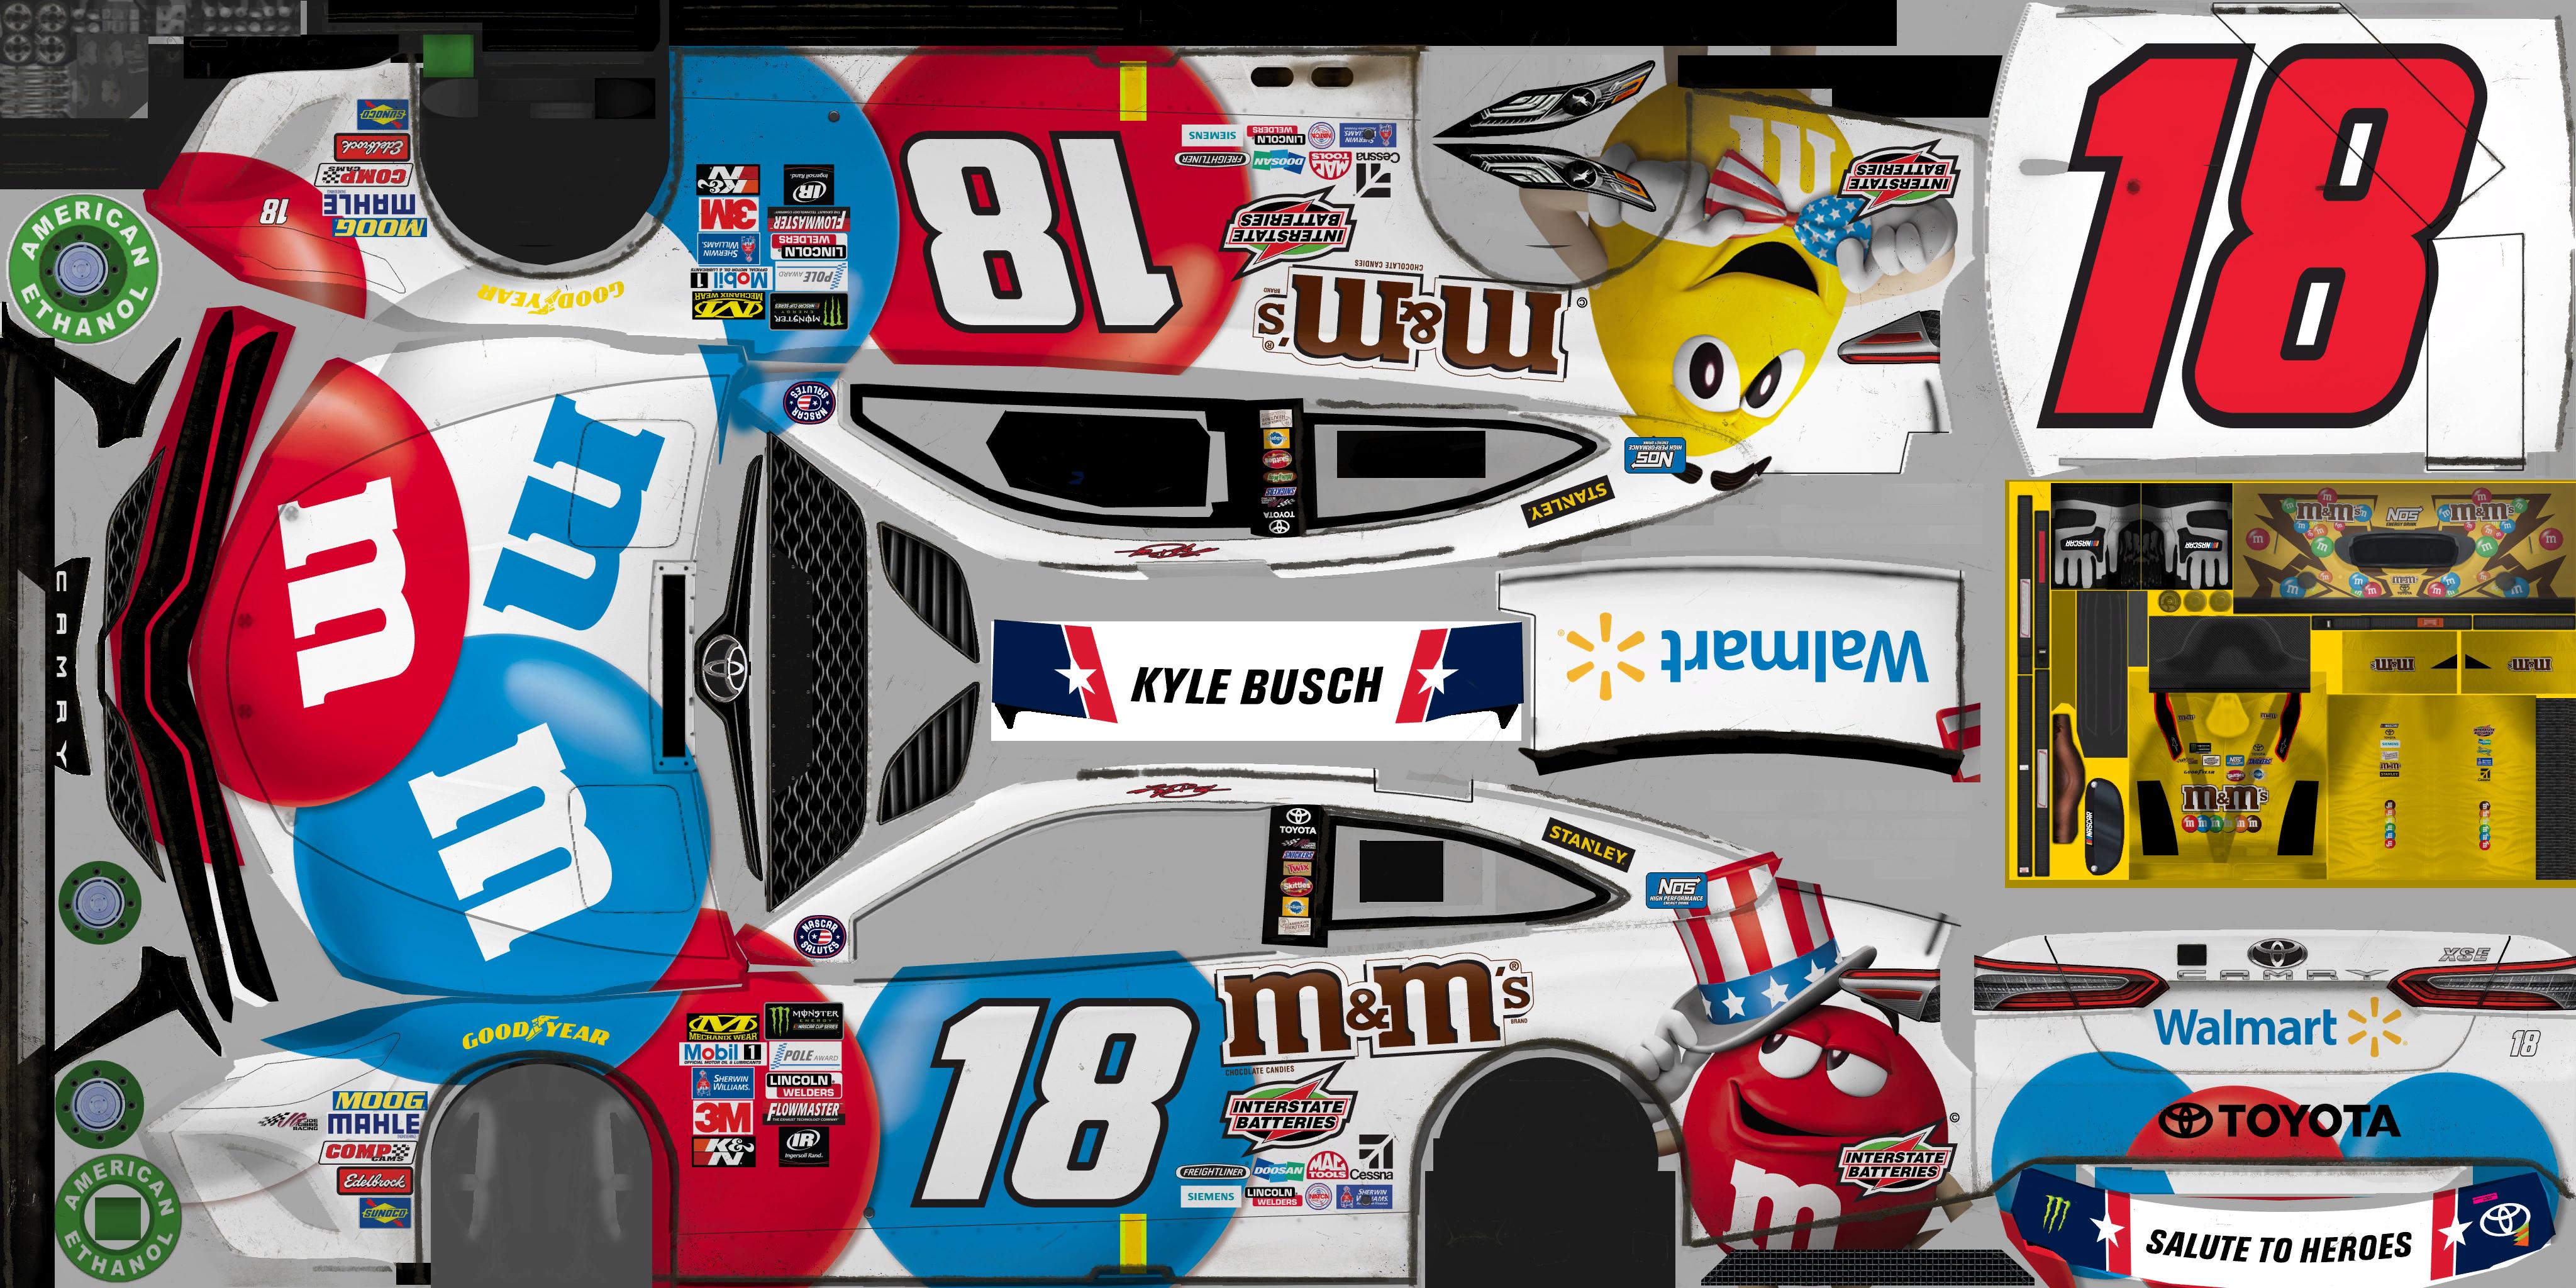 PC / Computer - NASCAR Heat 2 - #18 Kyle Busch - The